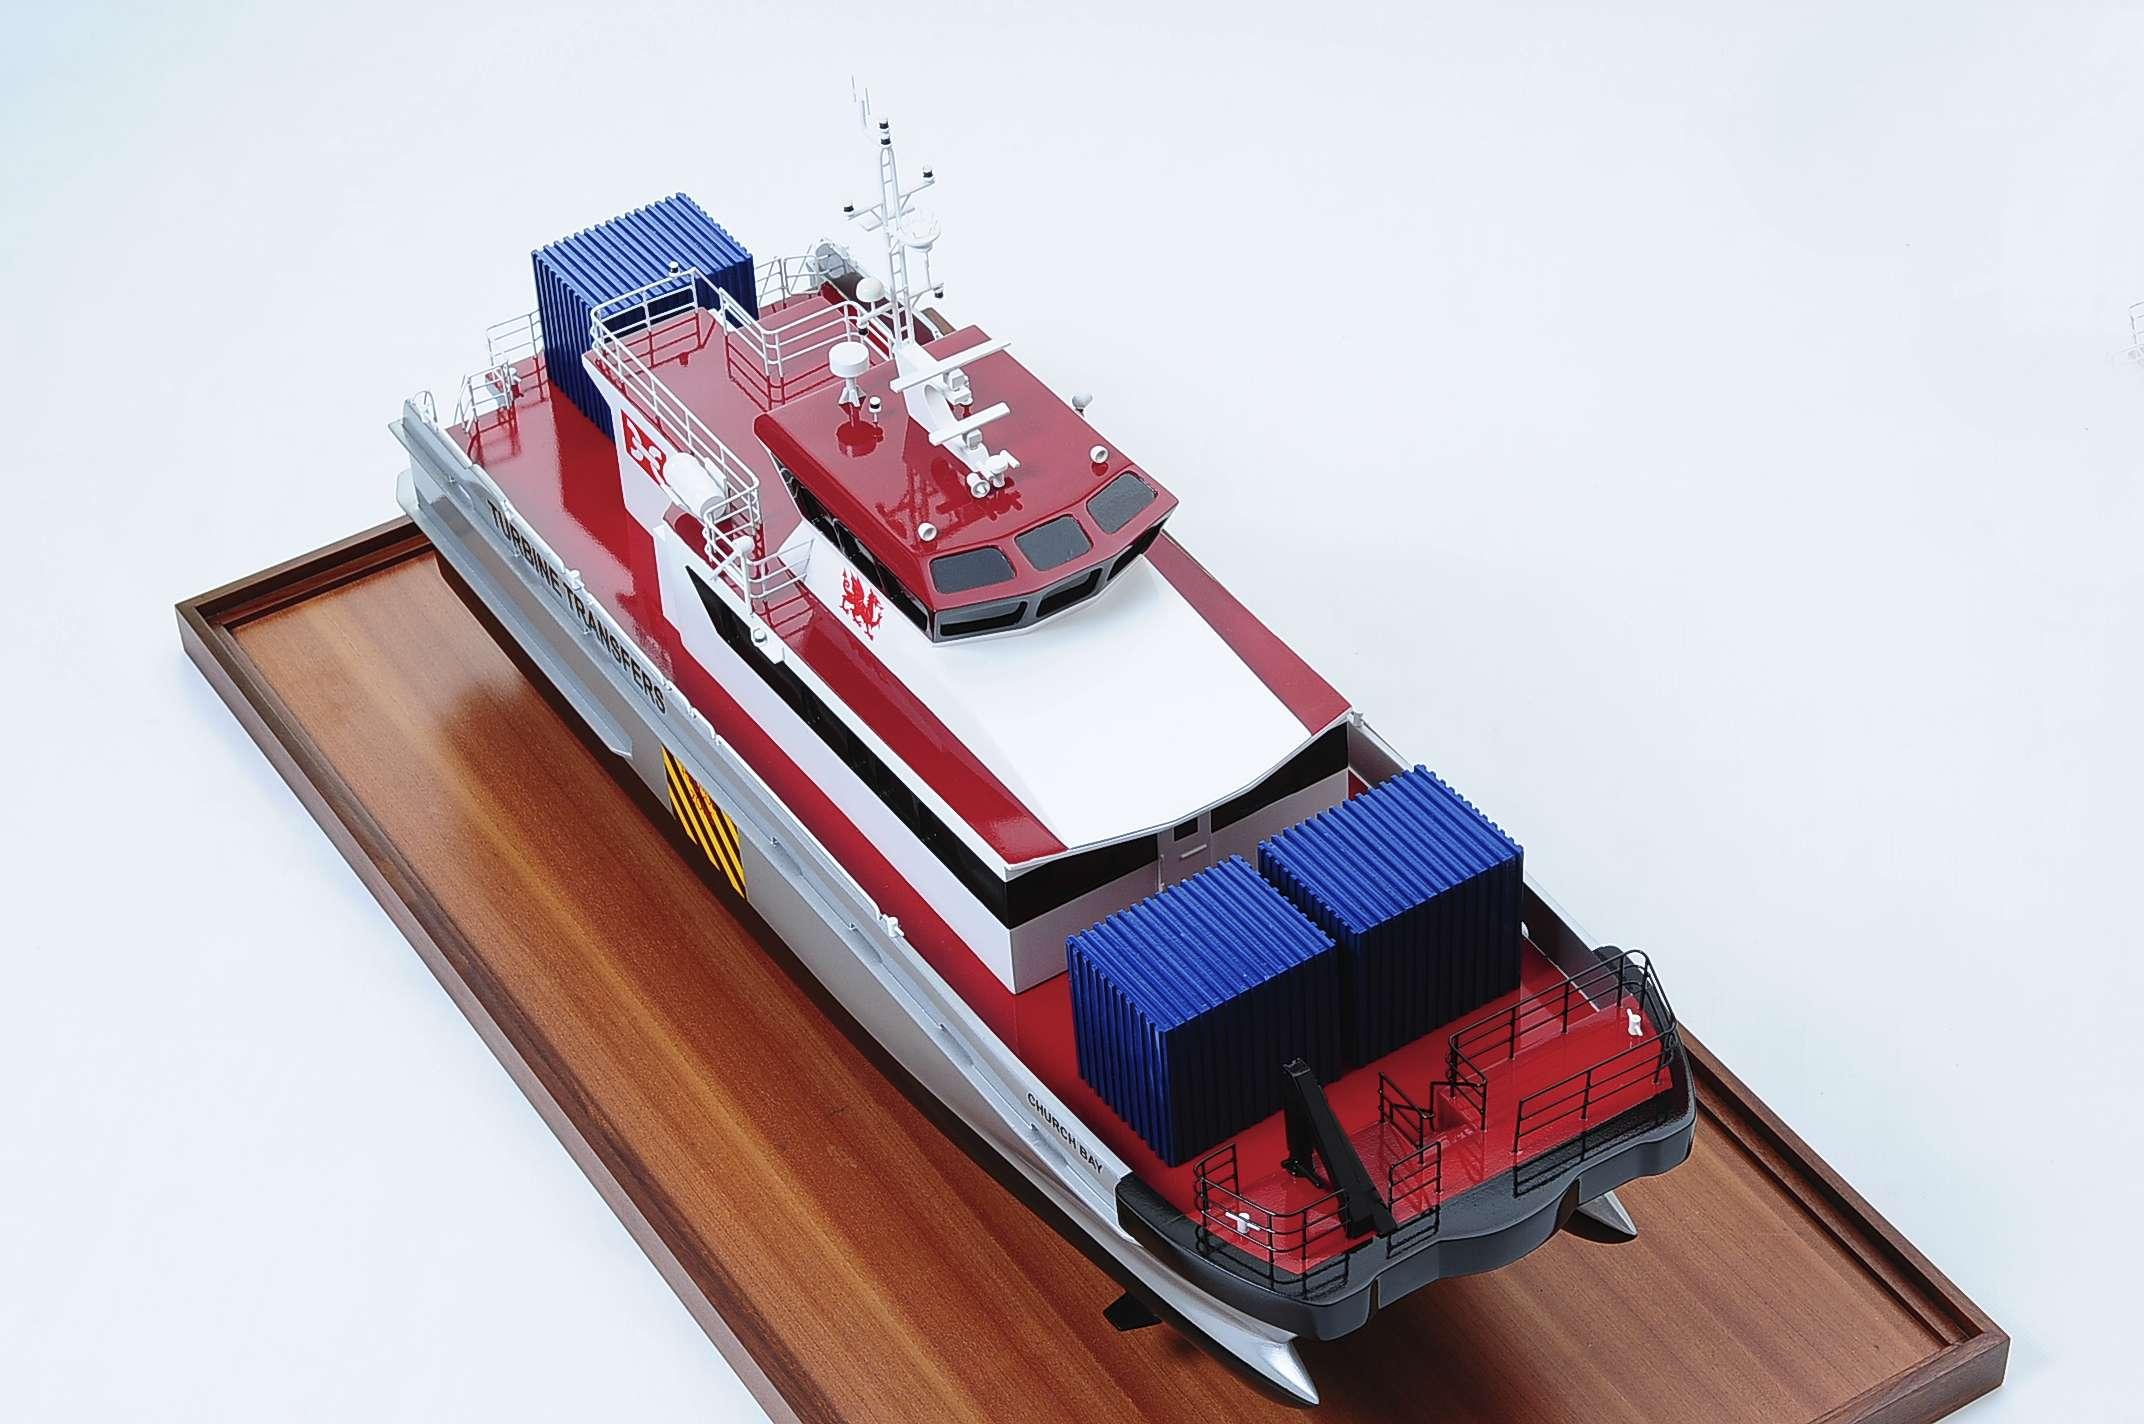 1439-4930-Turbine-Transfer-Catamaran-Model